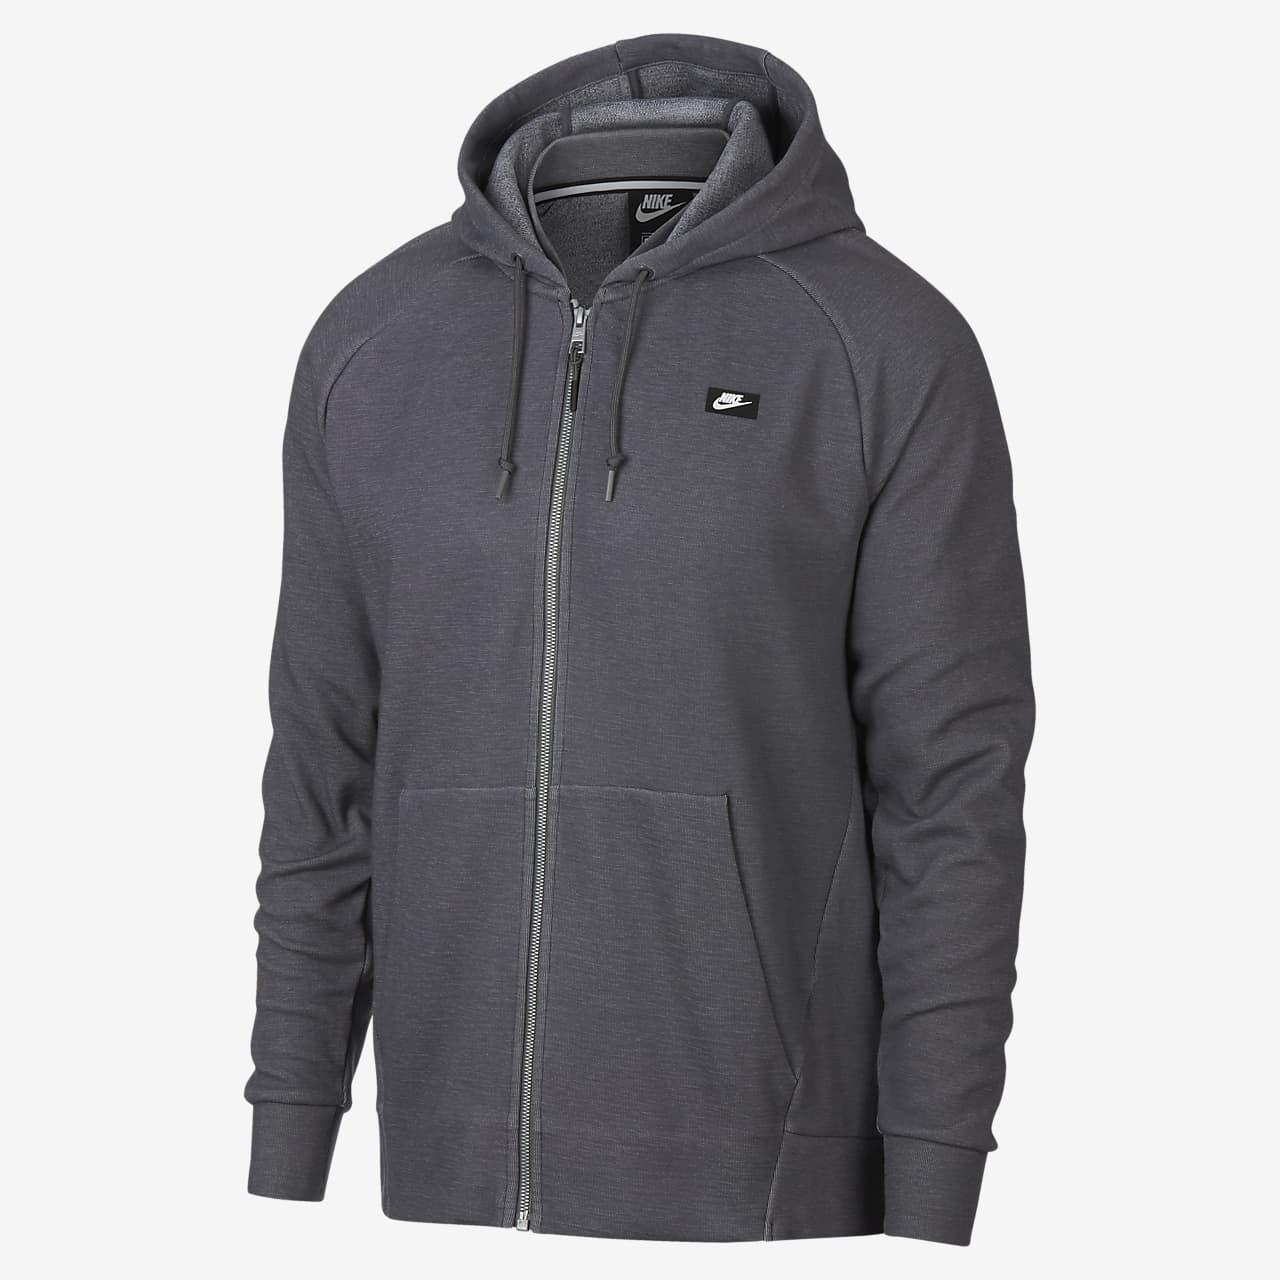 Sweat à capuche Nike Sportswear Optic Fleece pour Homme